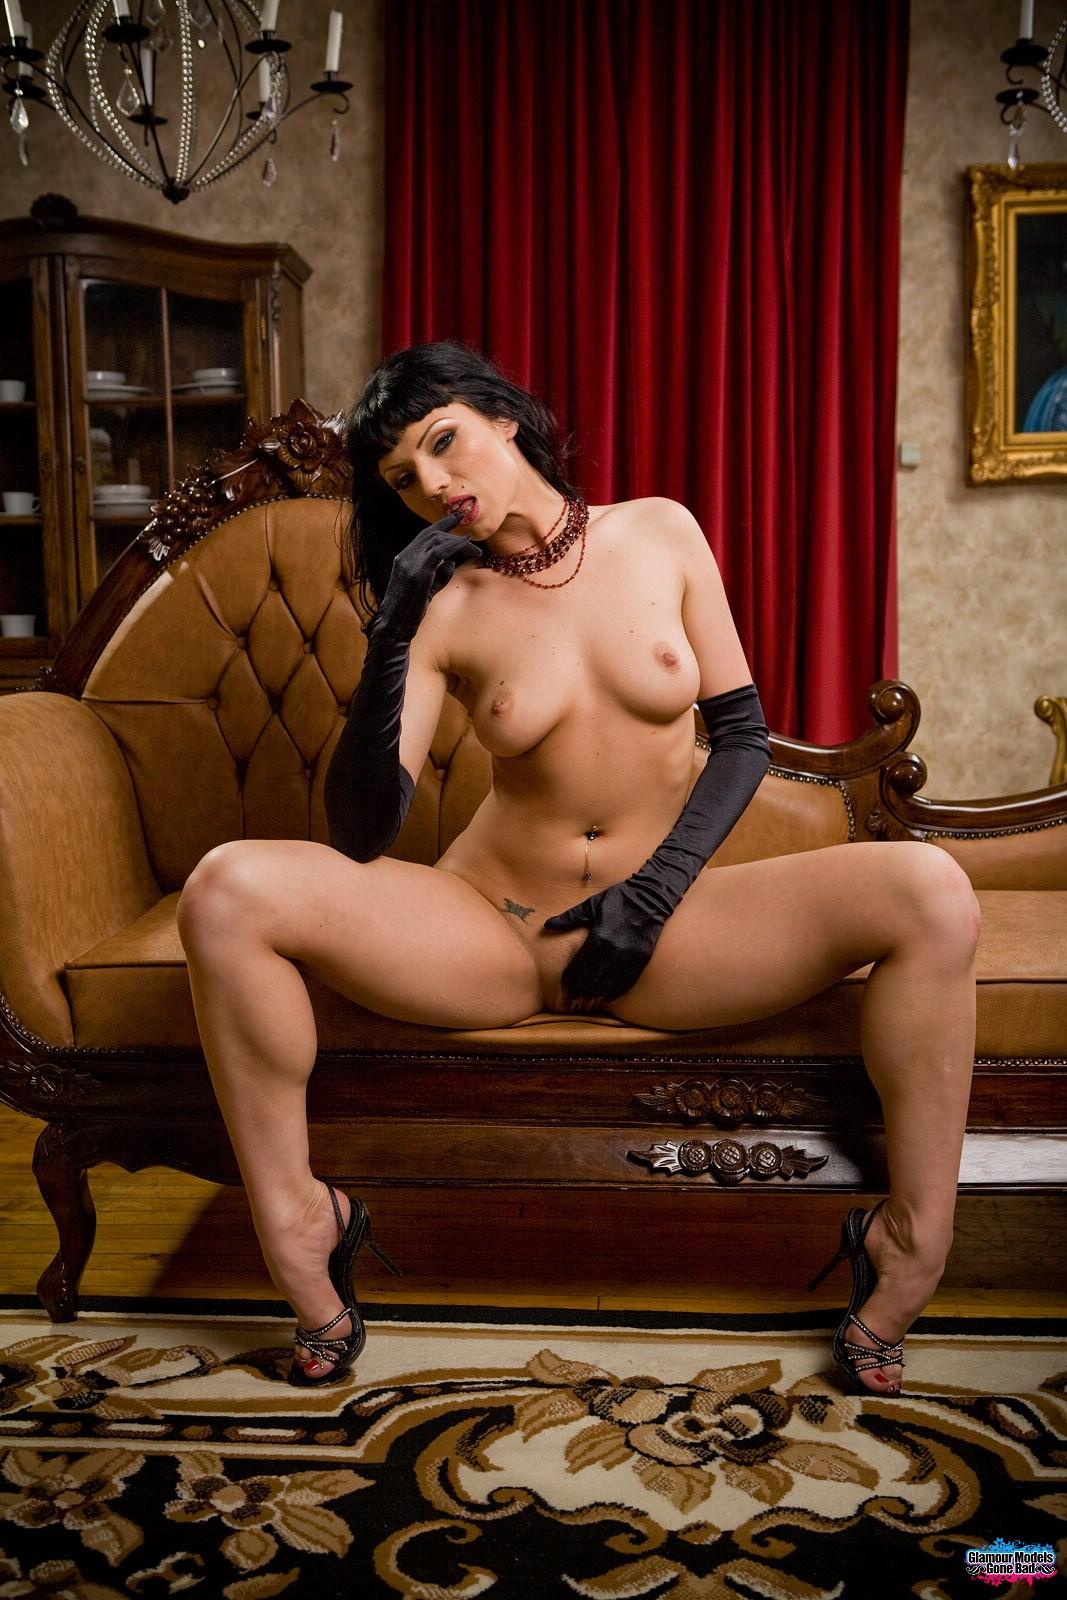 Deutsche xxx video hd Jessica rose nude pics